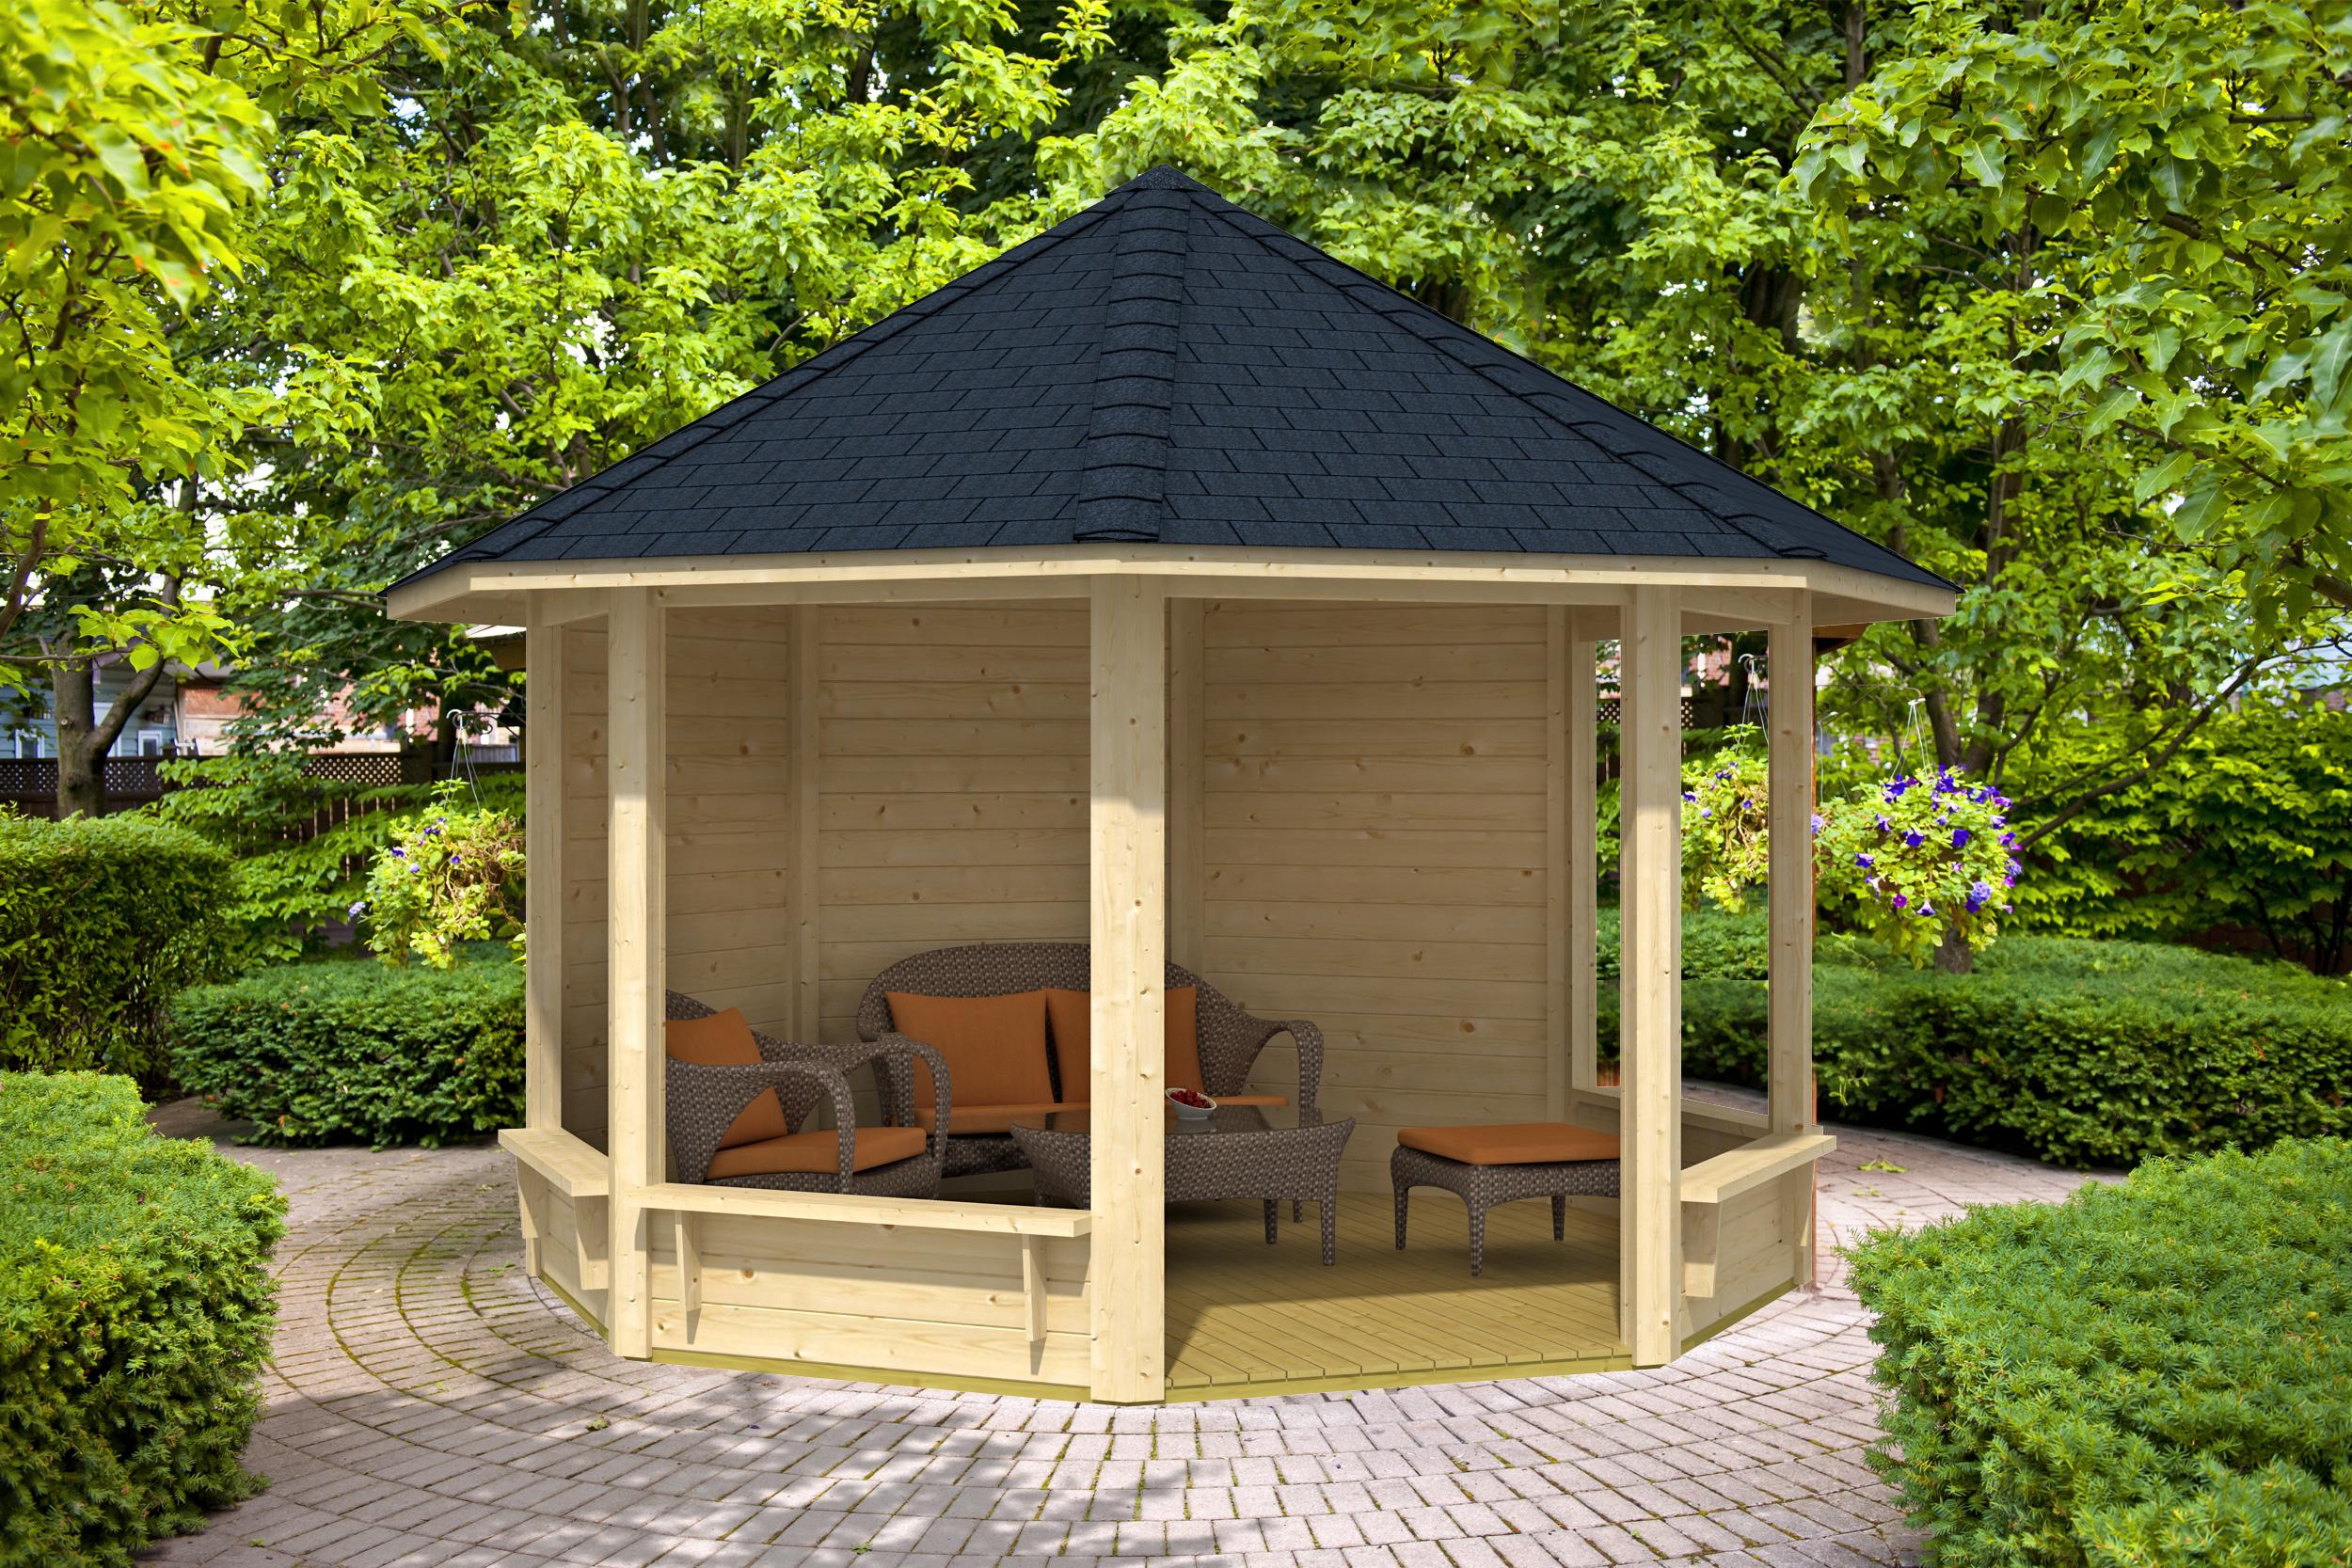 holzpavillon kaufen holz pavillon baus tze vom fachmann. Black Bedroom Furniture Sets. Home Design Ideas